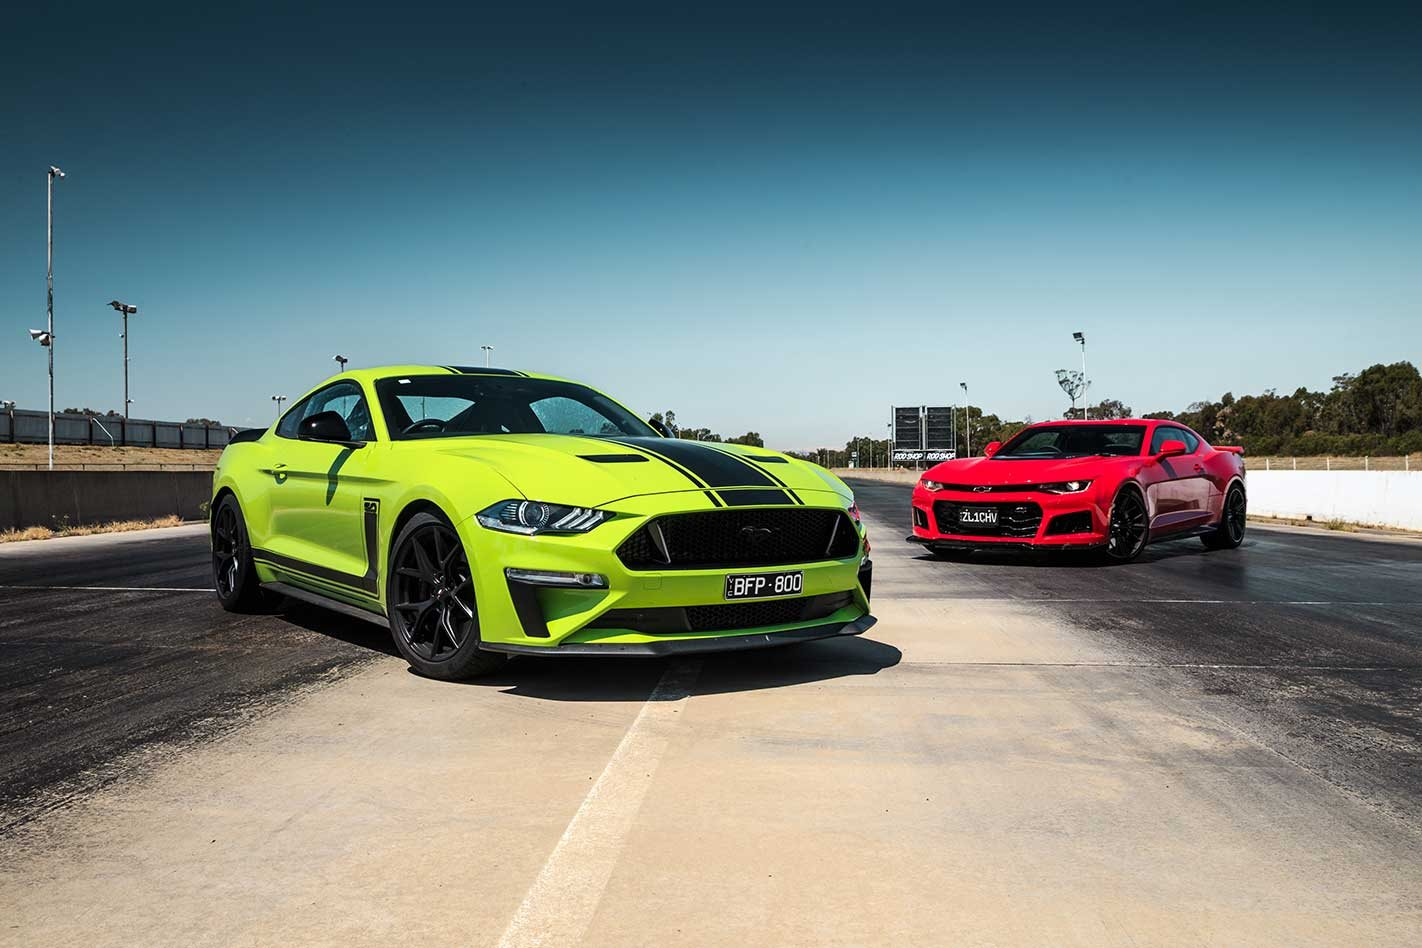 Ford Mustang R-Spec vs Chevrolet Camaro ZL1 comparison